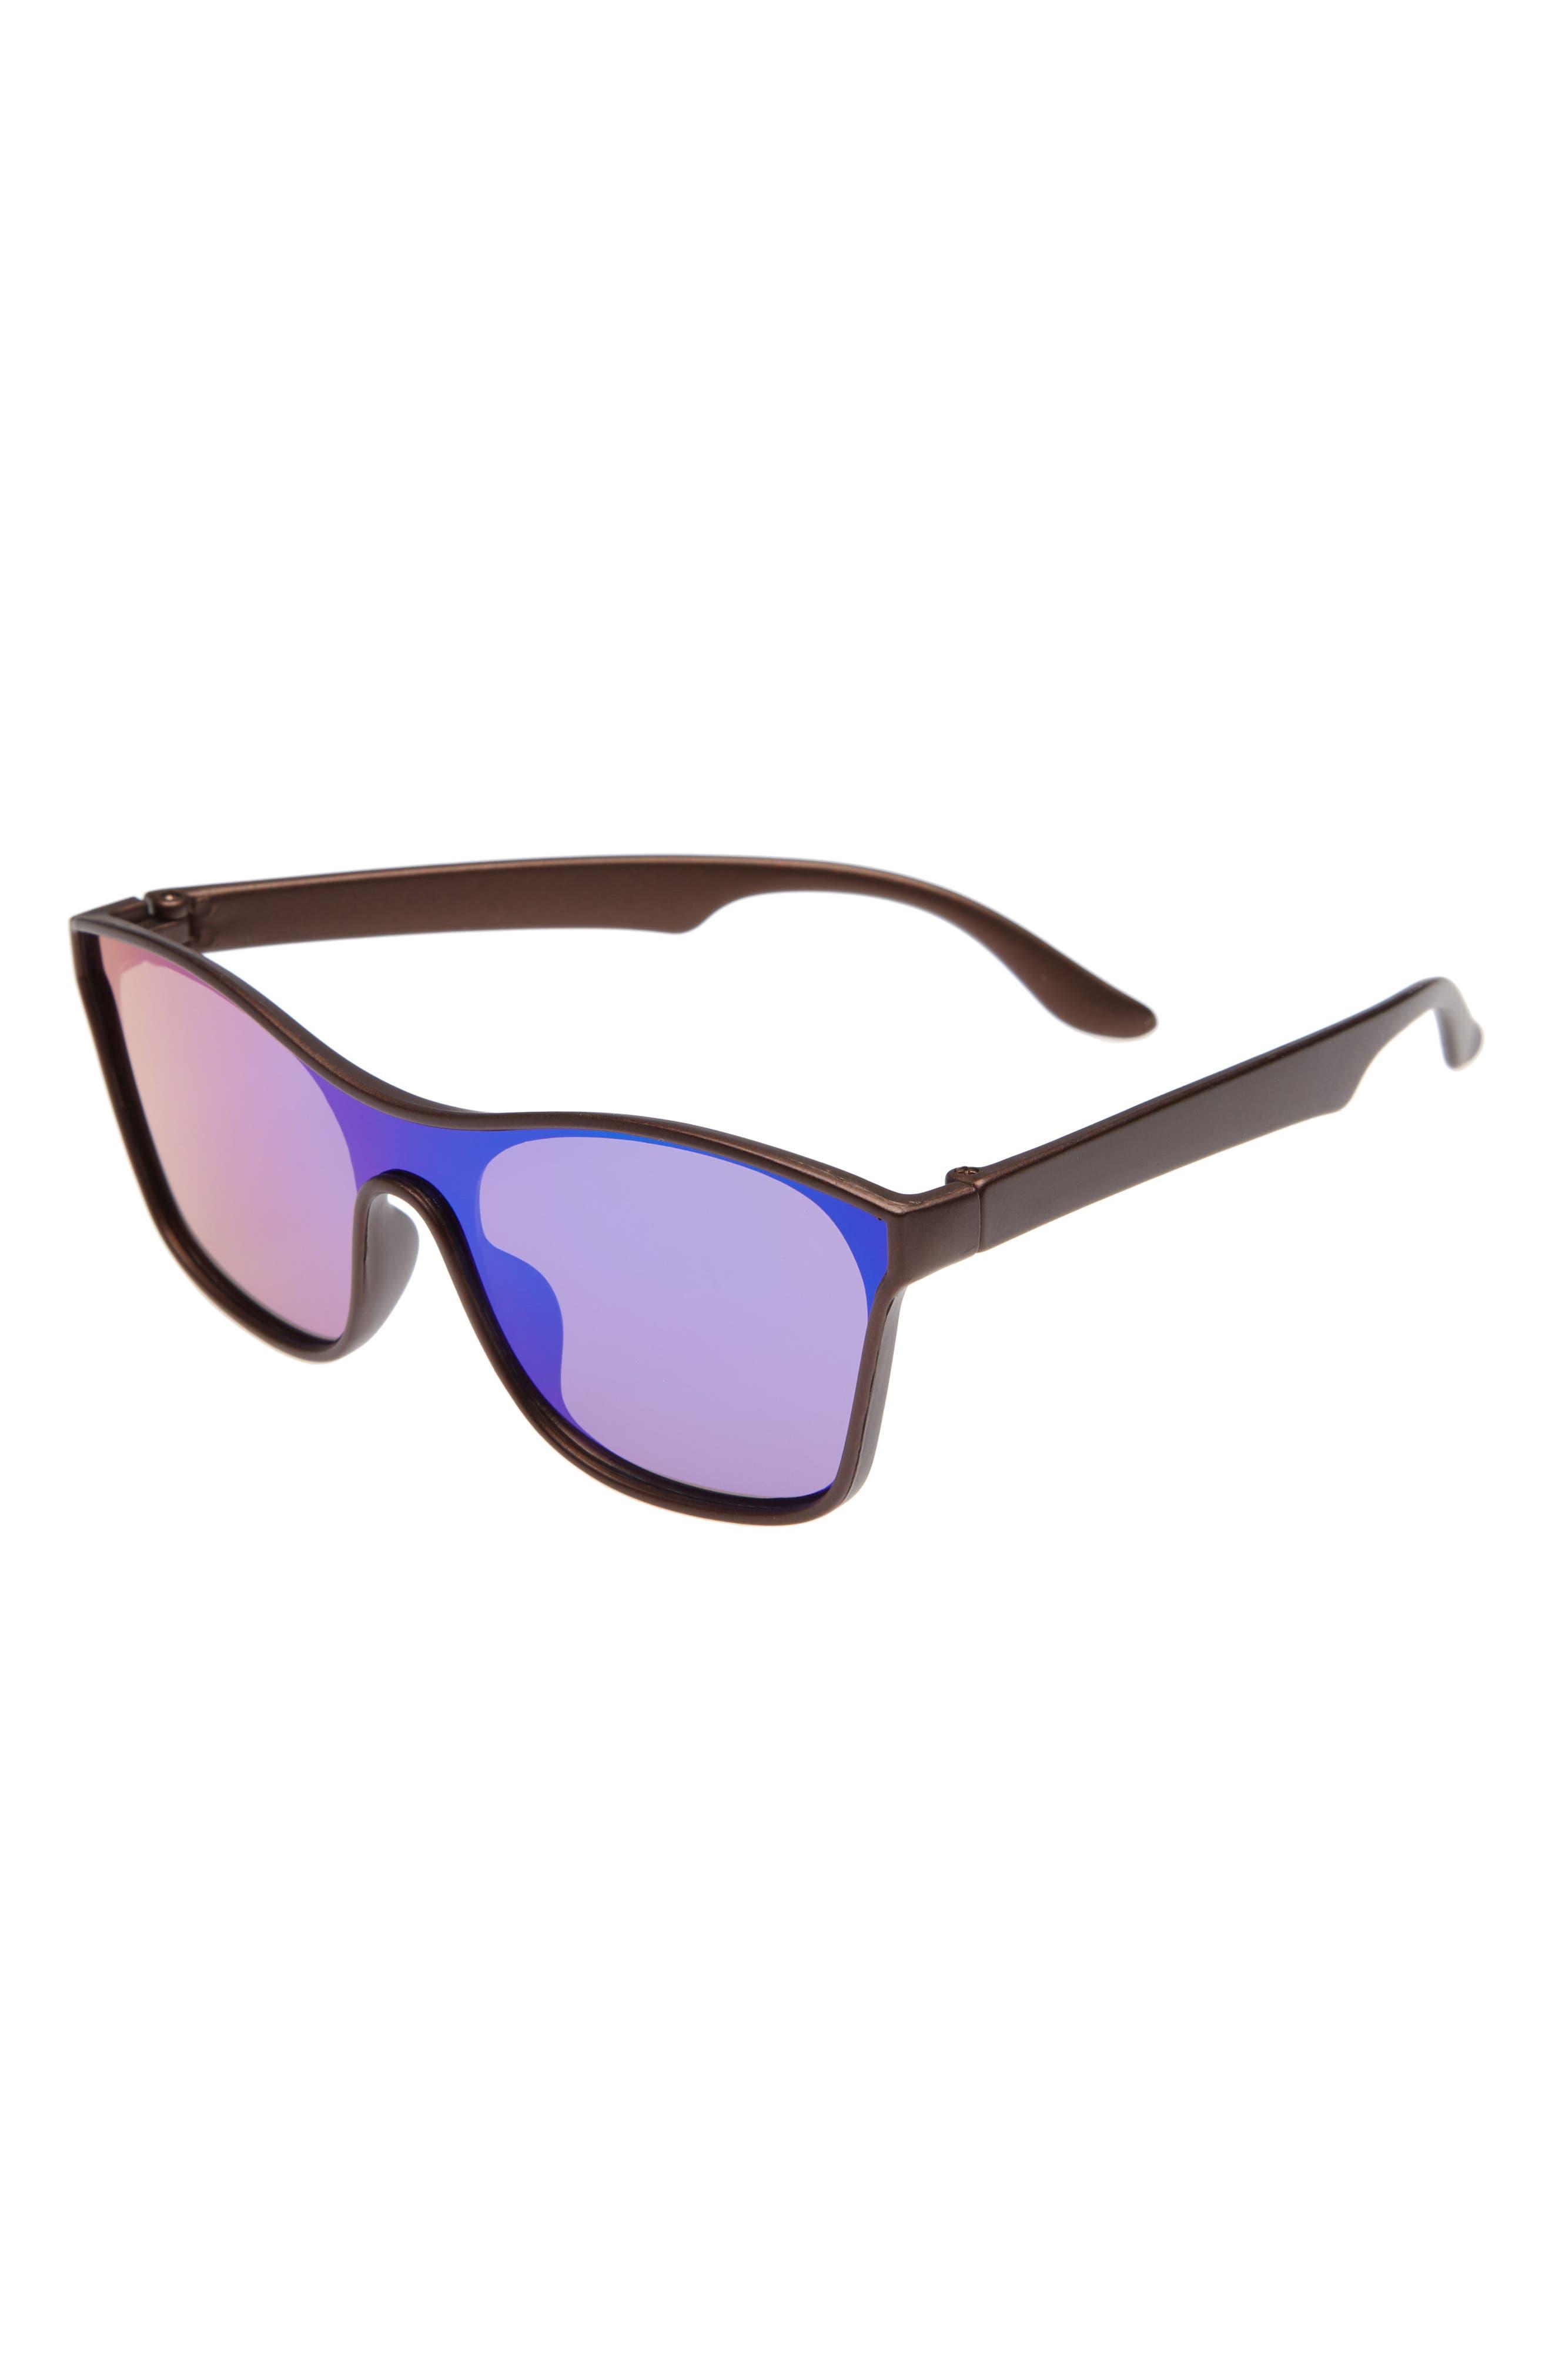 Fantas Eyes Mirrored Sunglasses (Boys)